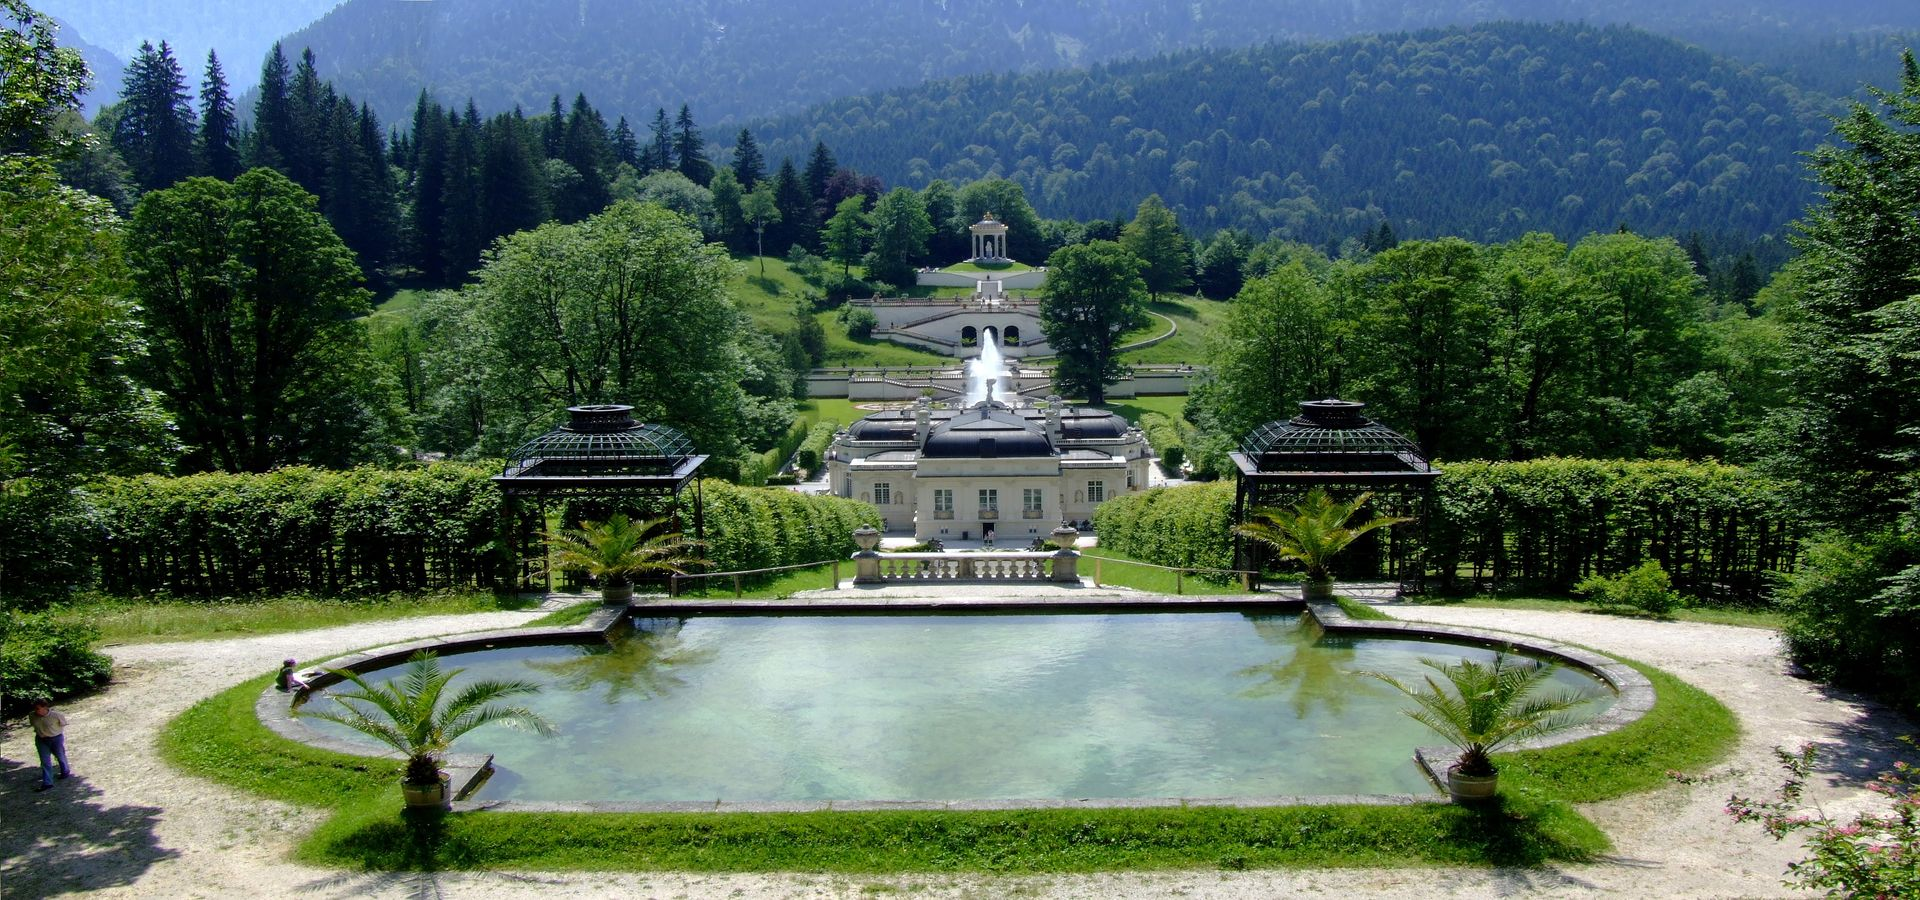 linderhof palace 1920900